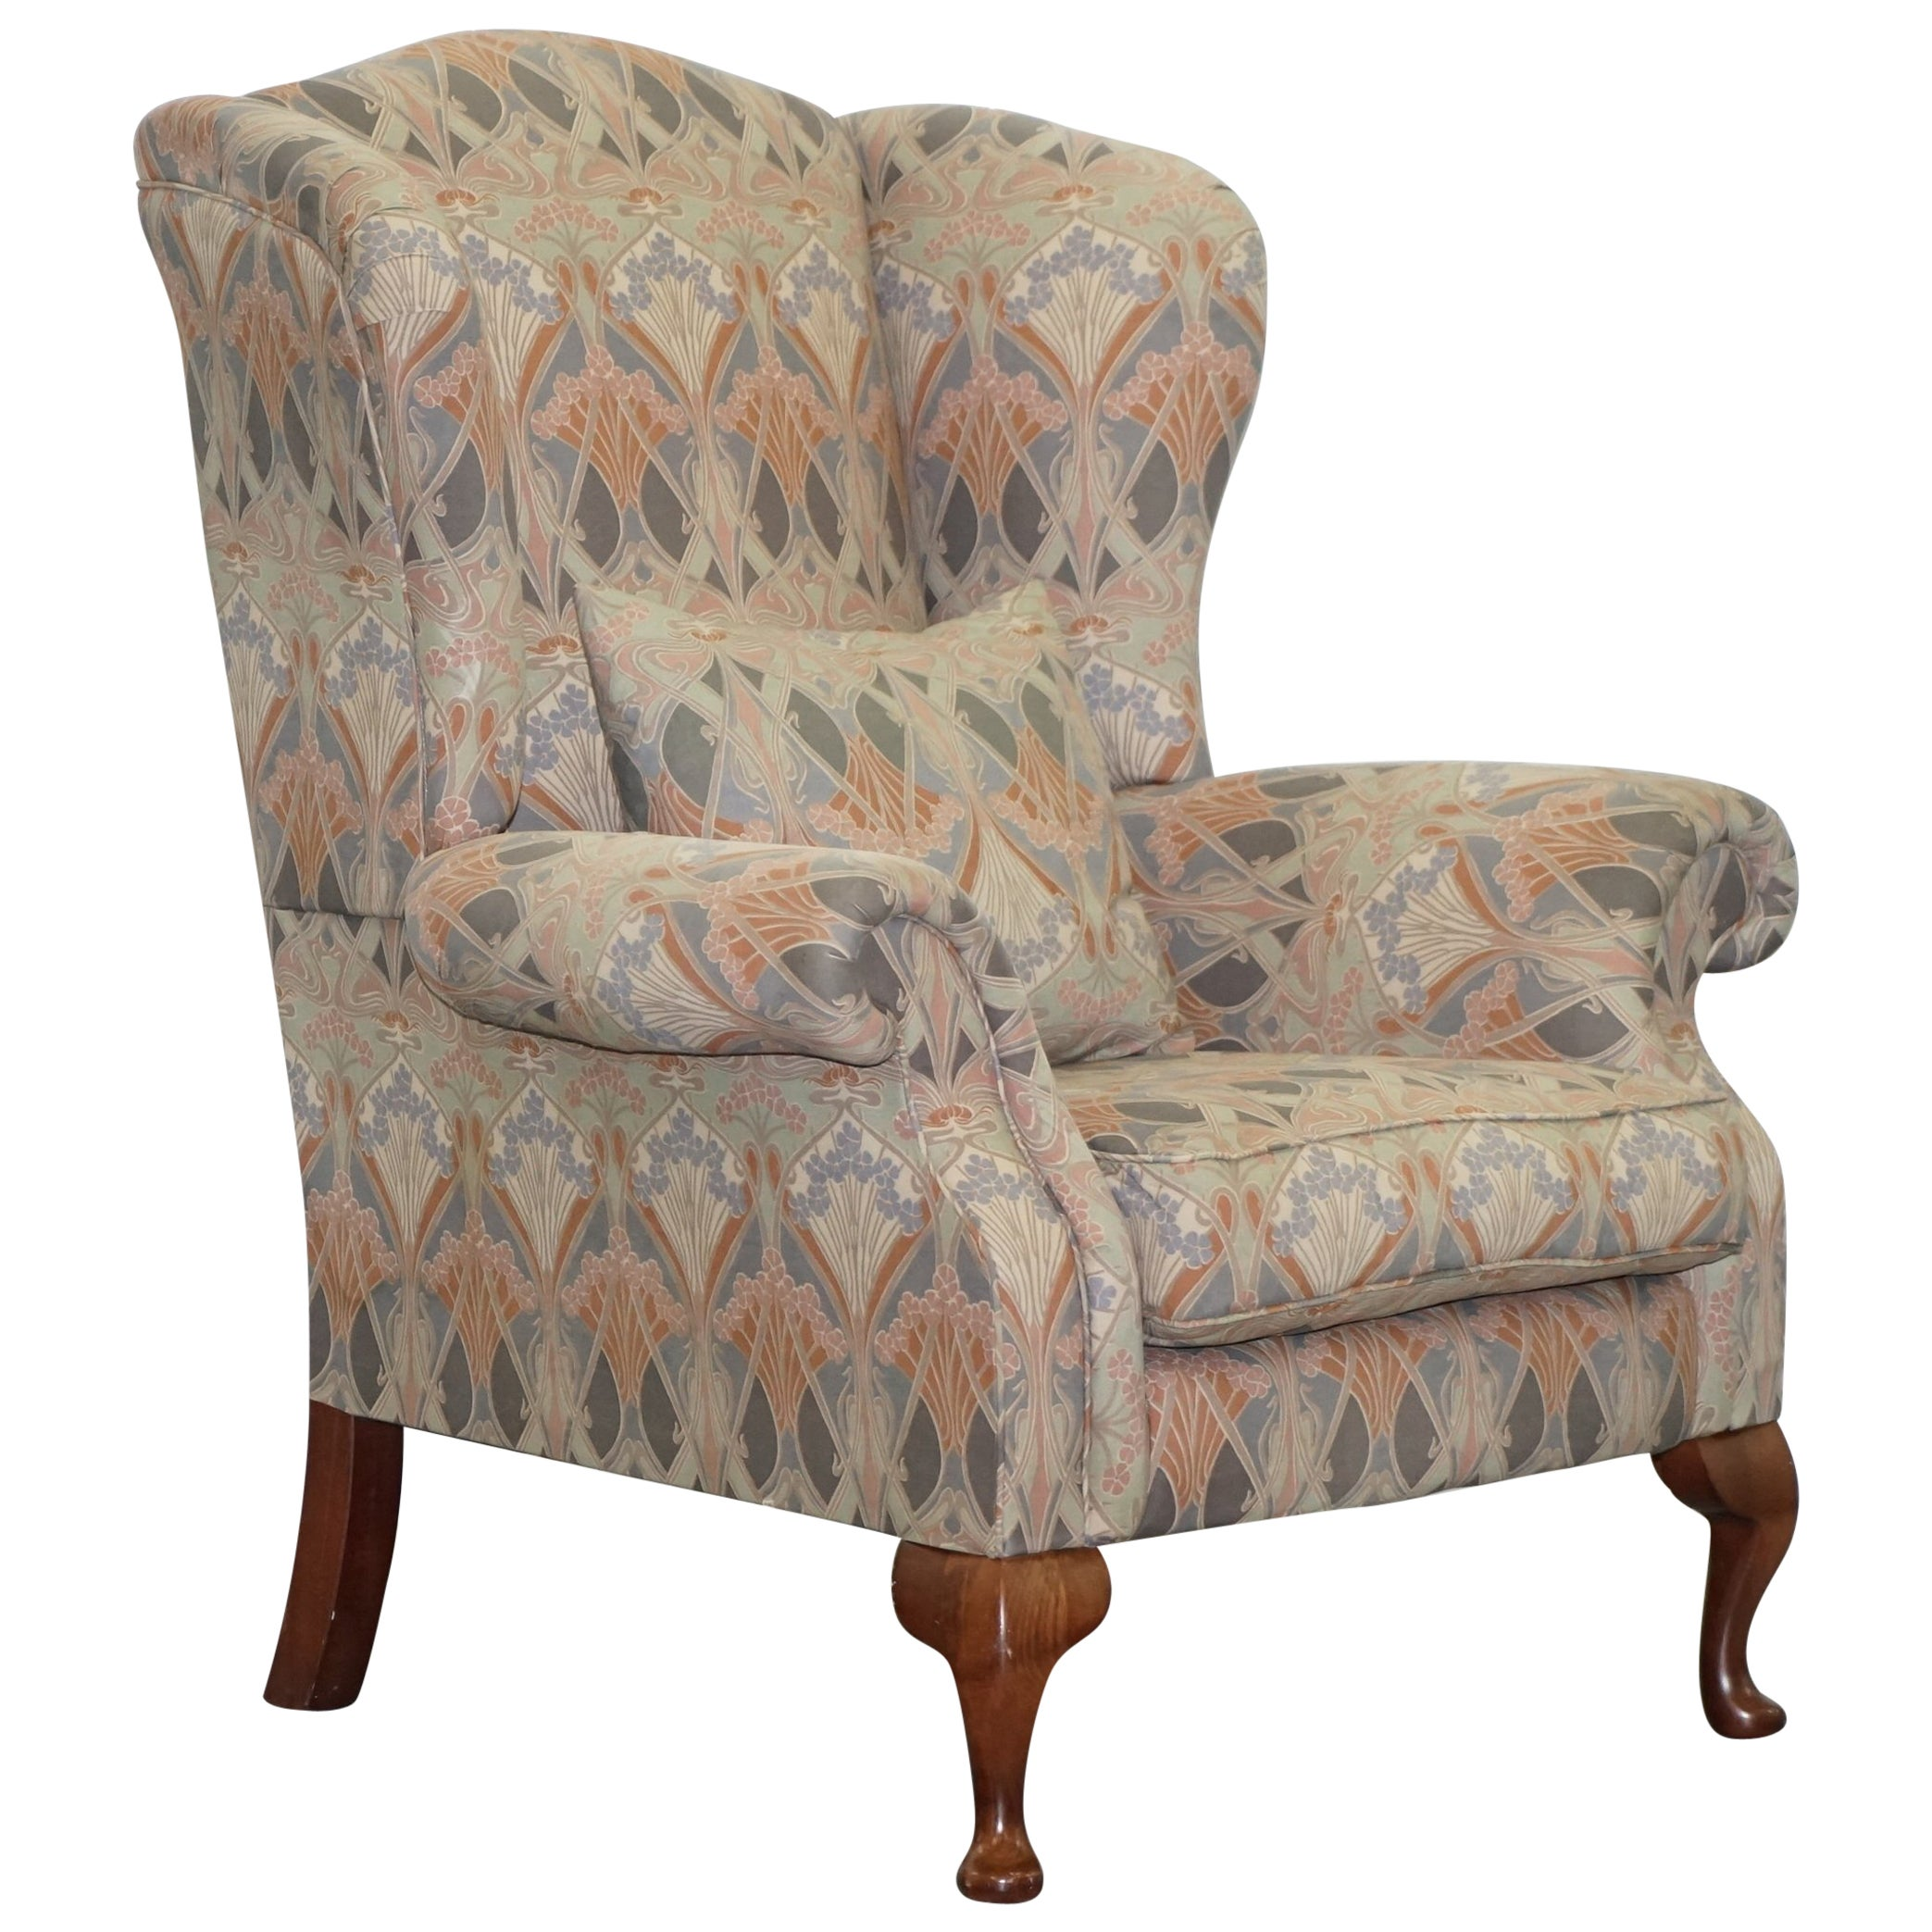 Rare Original Vintage Liberty London Ianthe Upholstered Wingback